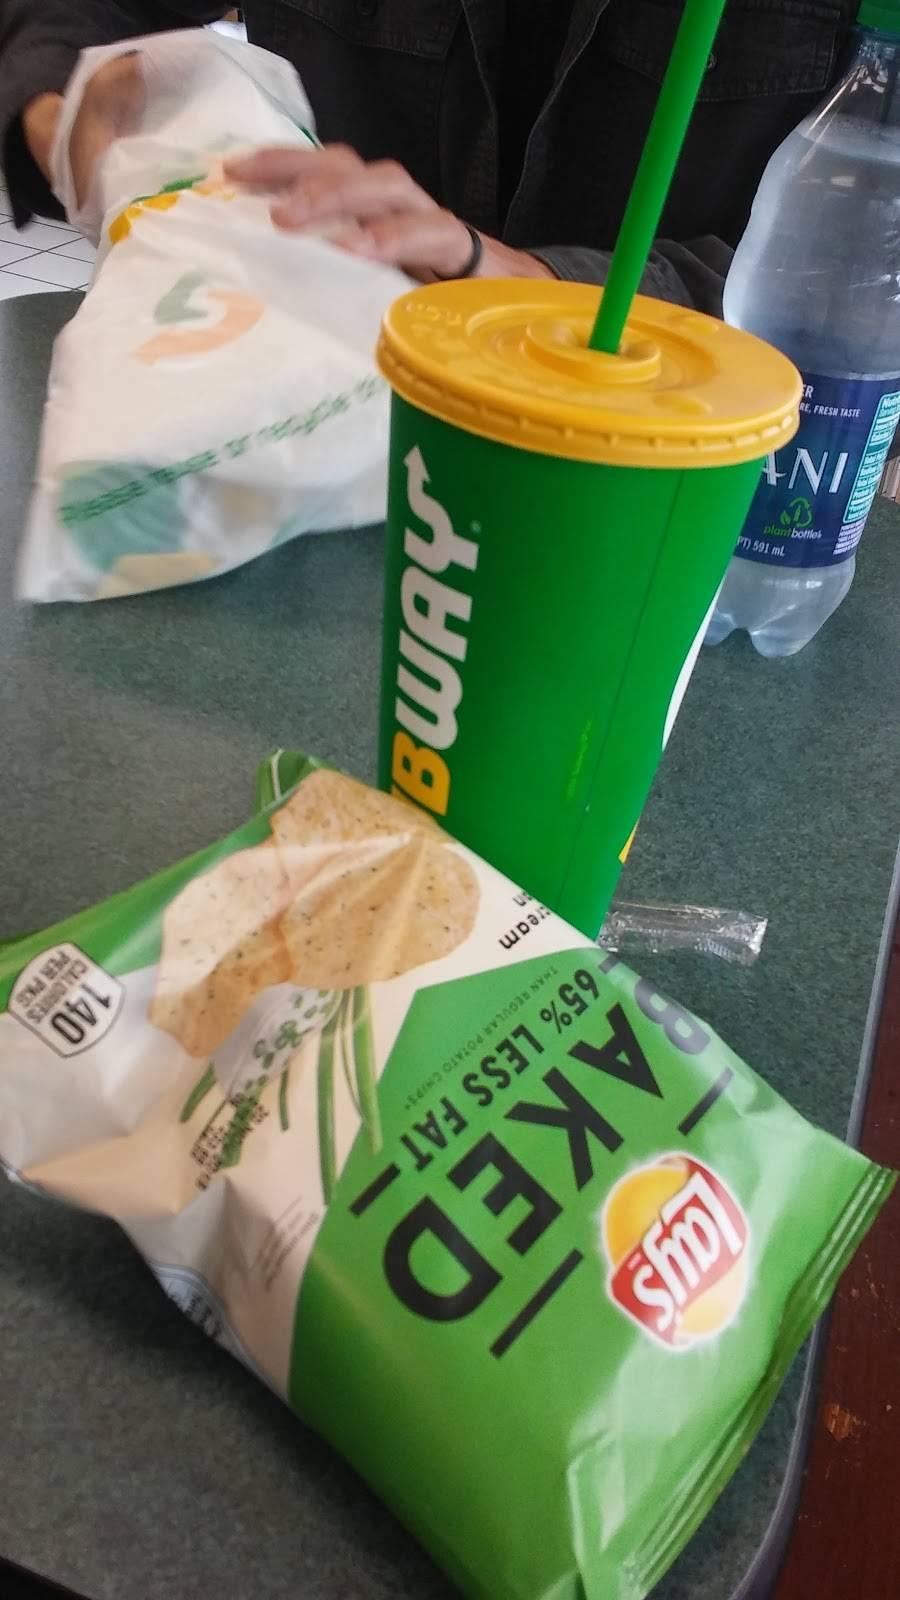 Subway | restaurant | 942 Washington St, Middletown, CT 06457, USA | 8603462066 OR +1 860-346-2066